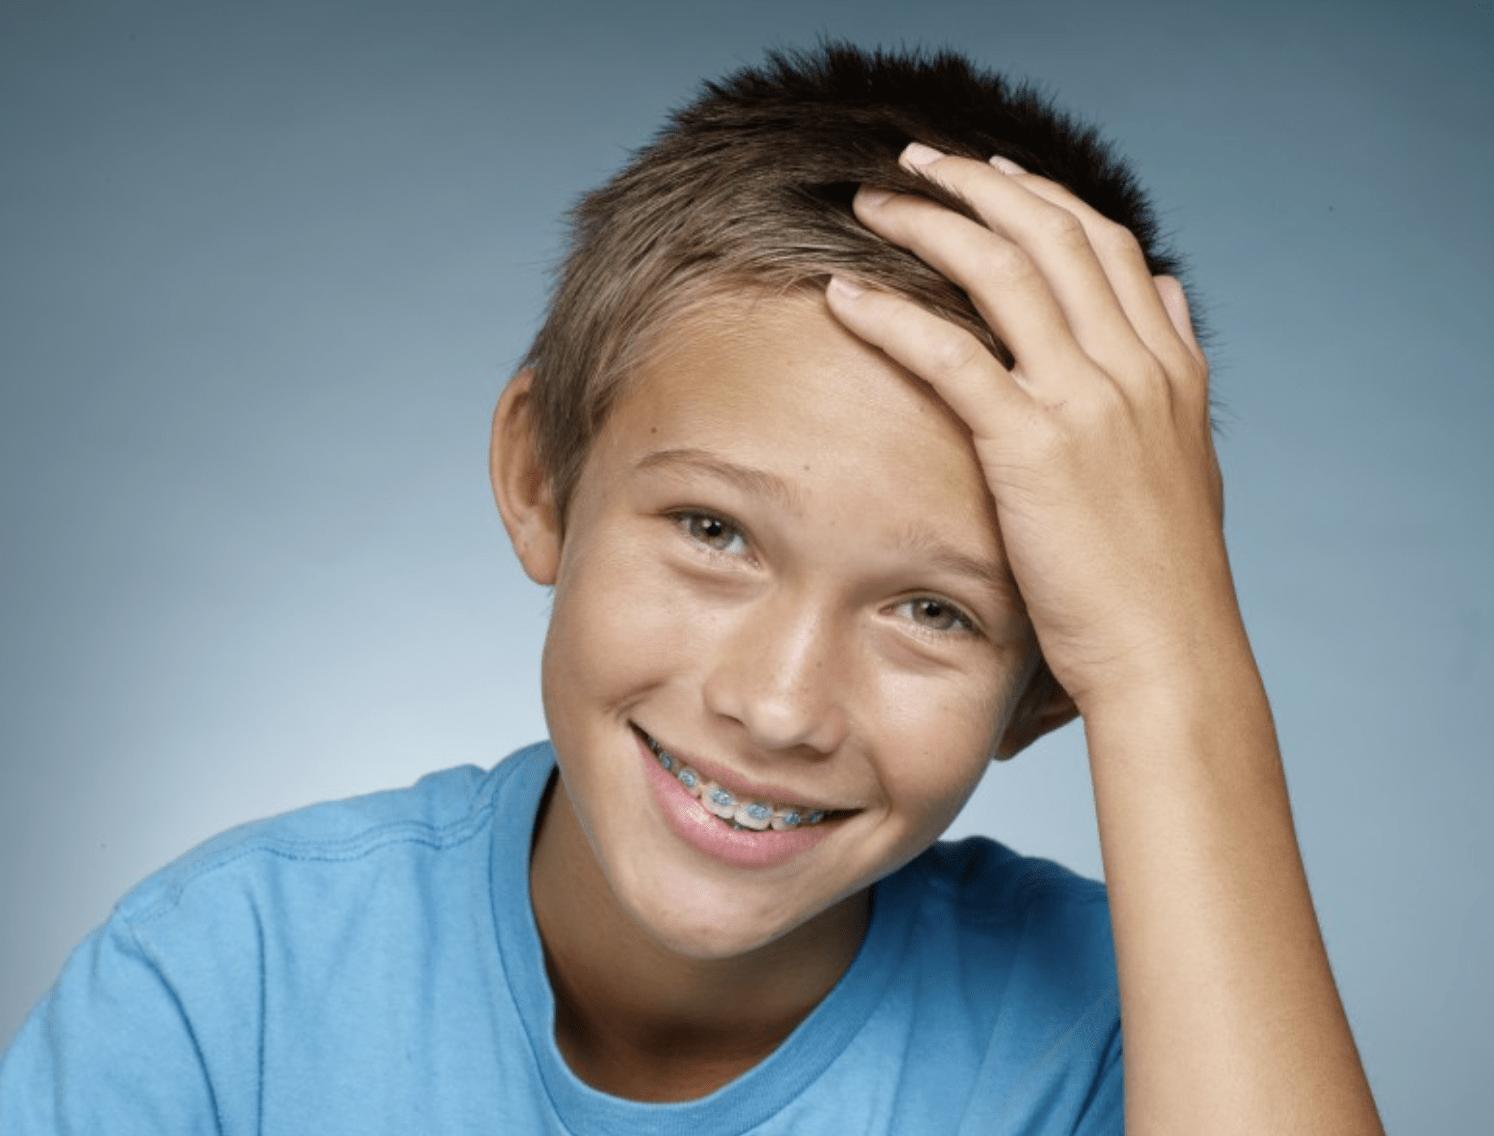 kid with braces